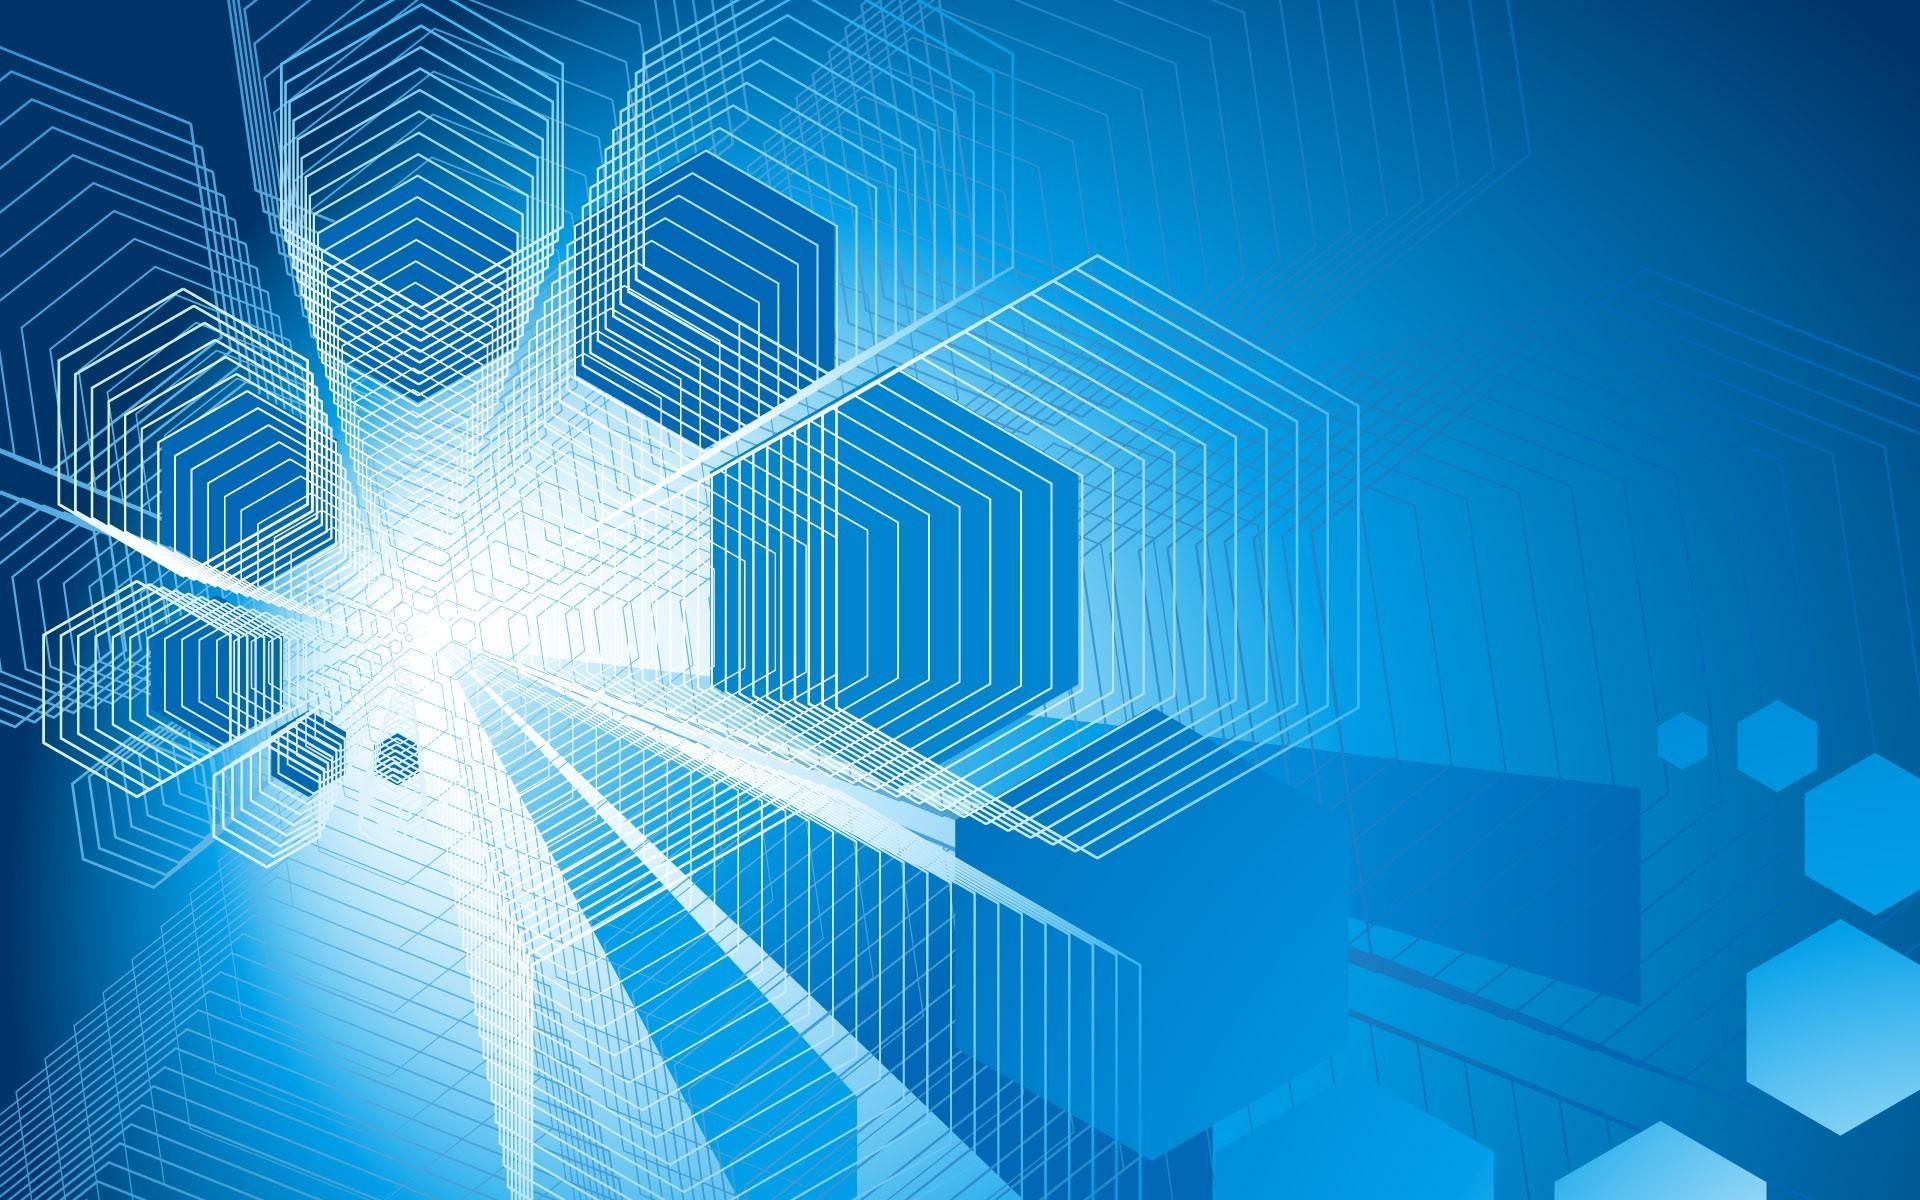 Blue Matrix Tones Background Wallpaper for PowerPoint Presentations